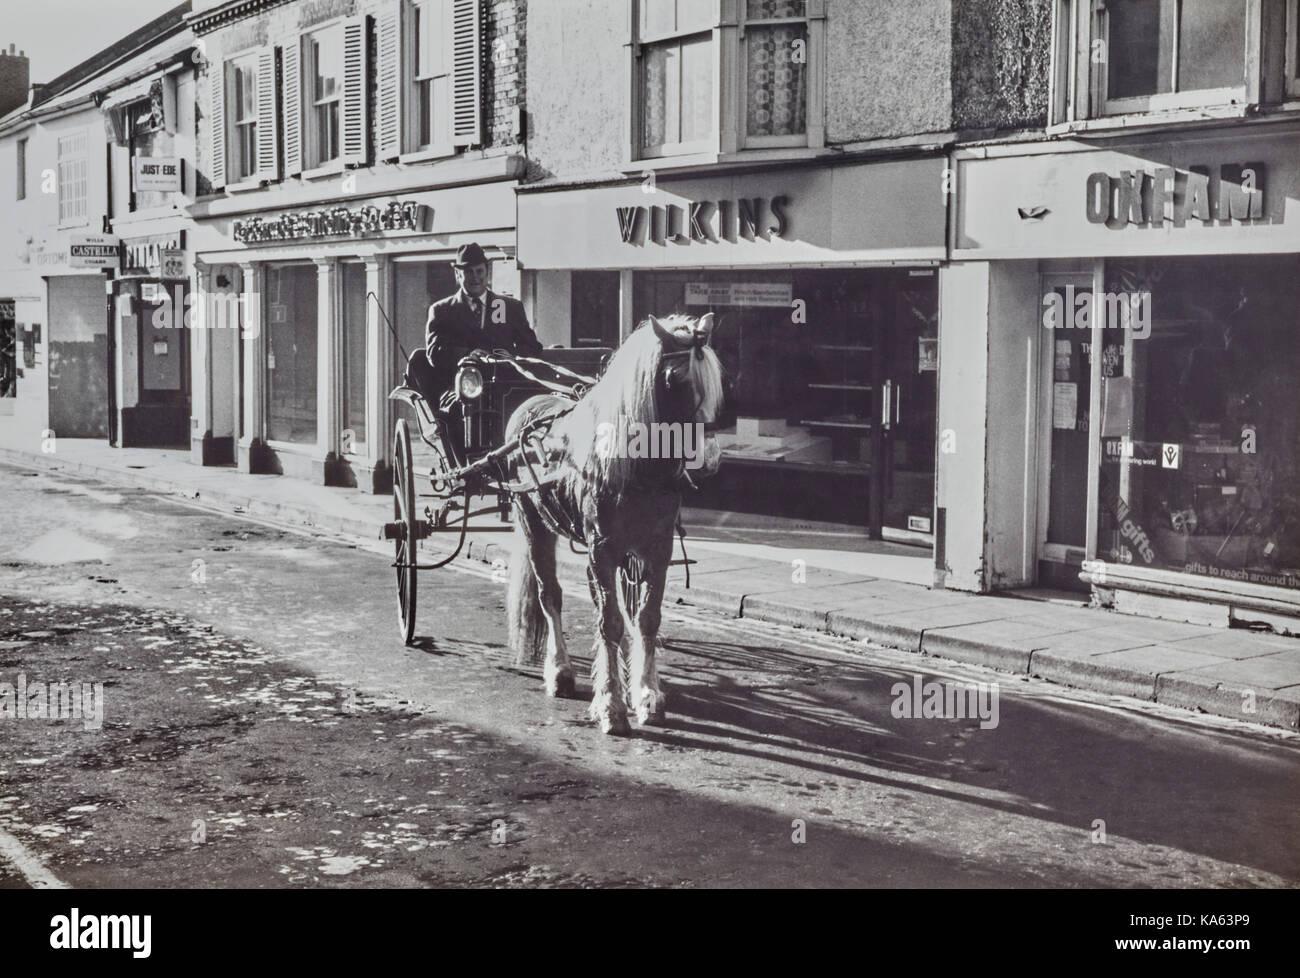 Man and pony cart in Cosham High Street 1981 Stock Photo